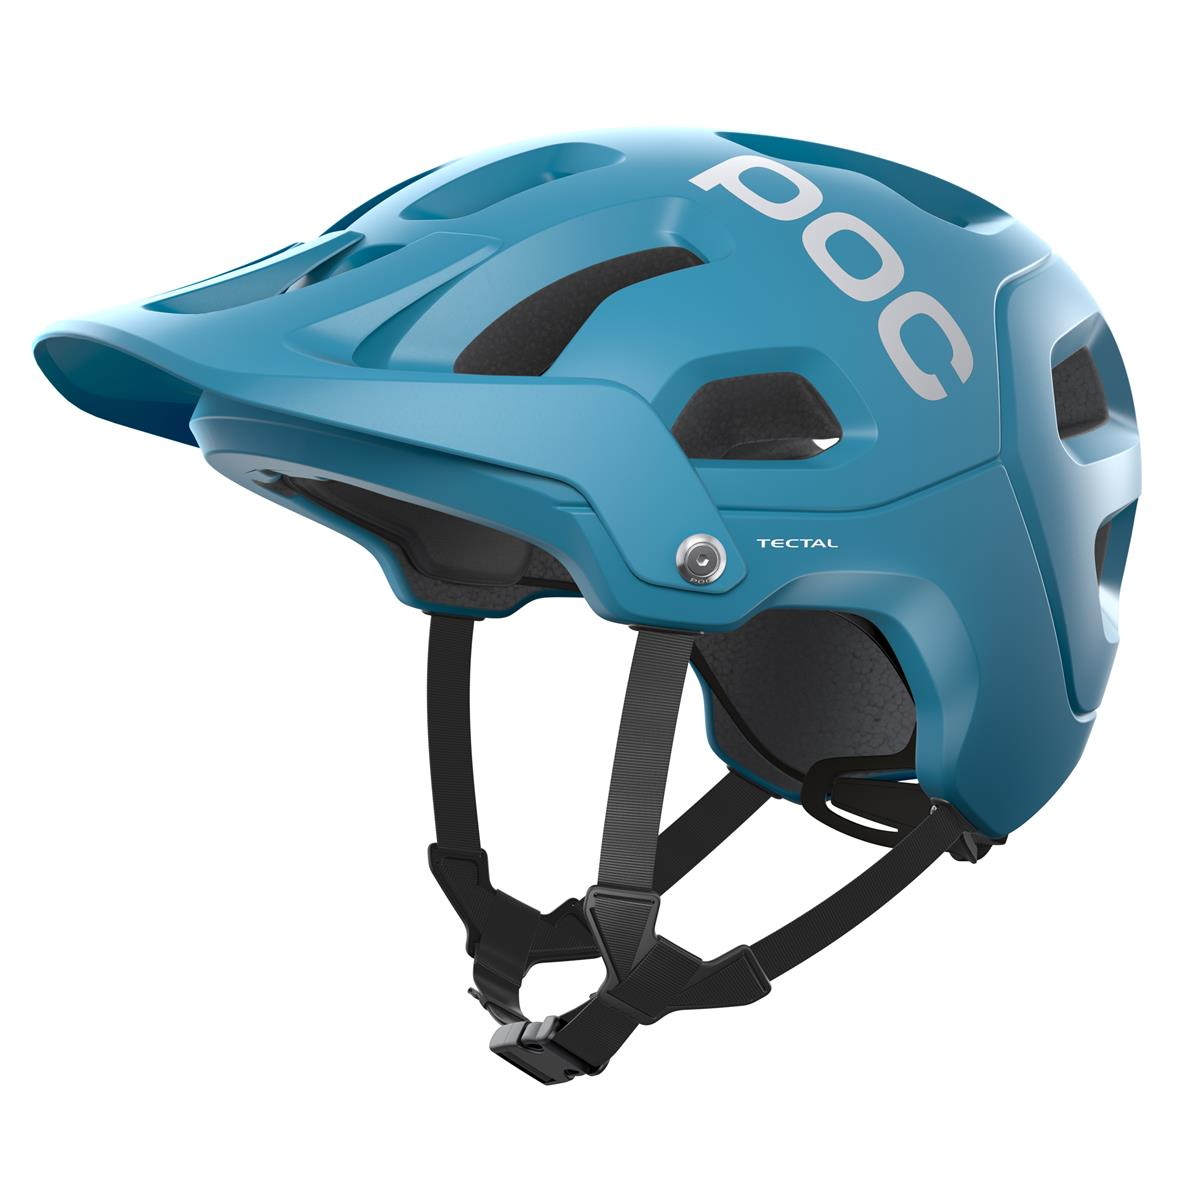 Enduro Helmet Tectal Basalt Blue Matt size XS-S (51-54cm)